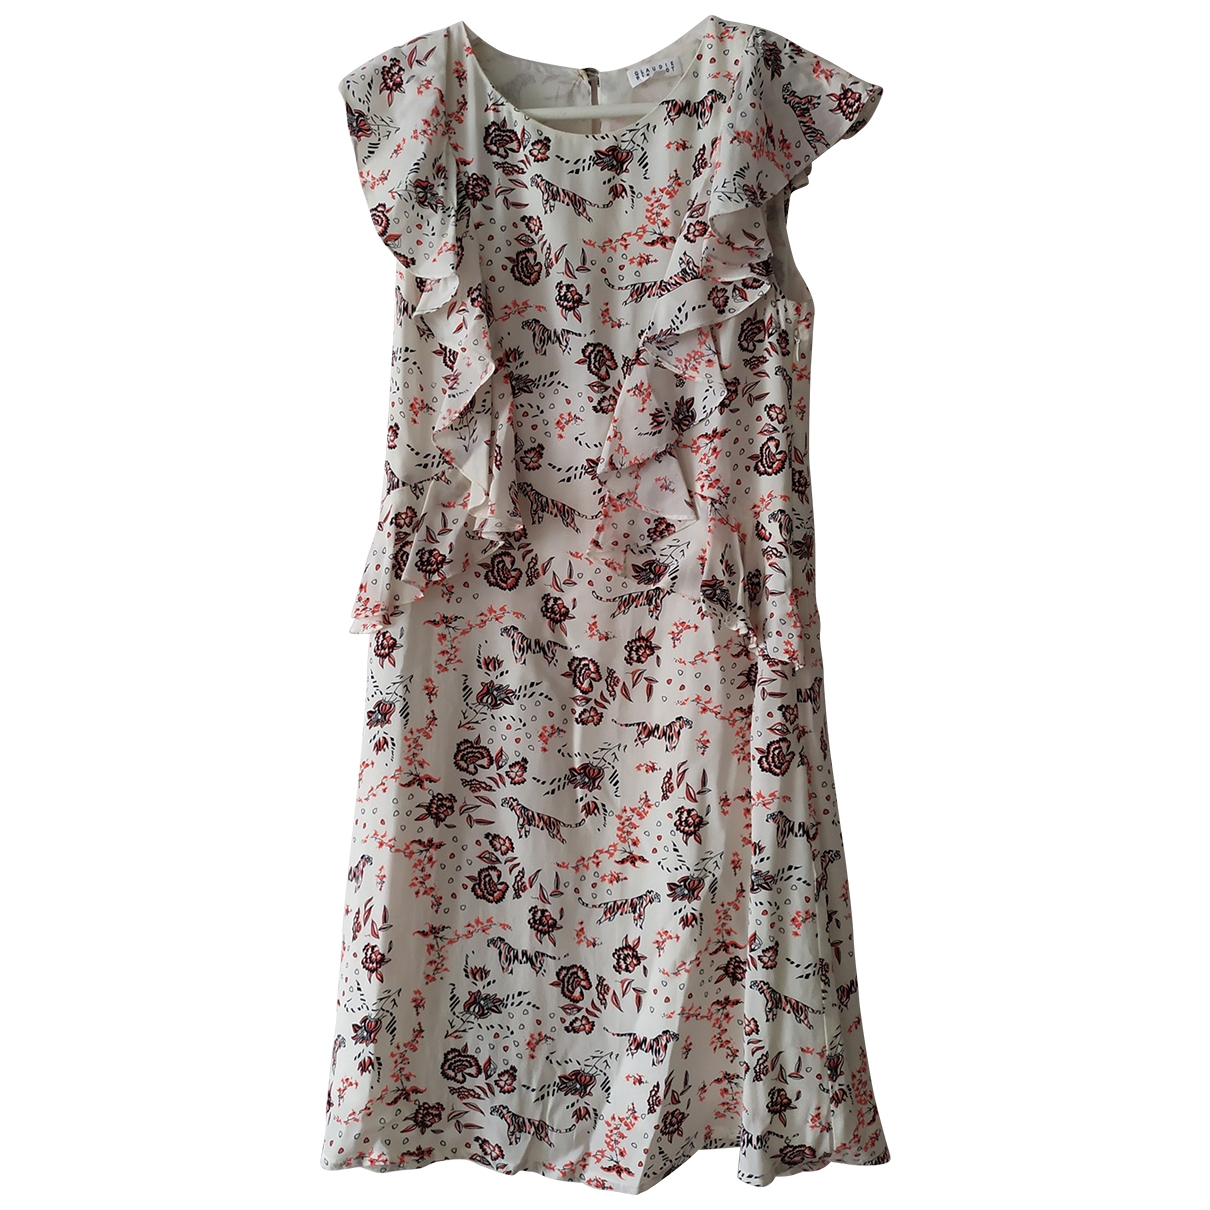 Claudie Pierlot \N White dress for Women 36 FR